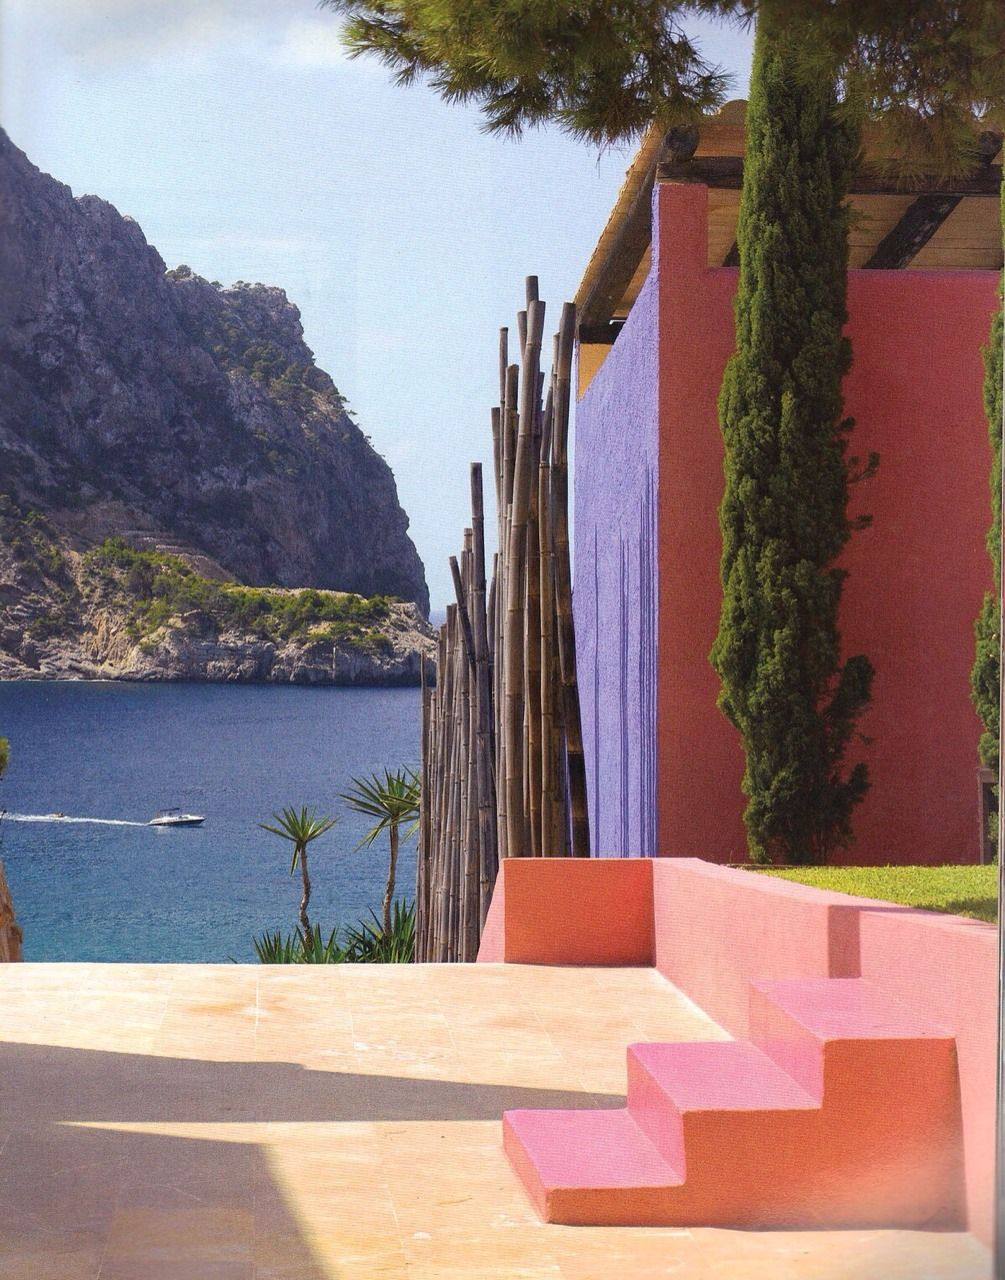 Architecture of Luis Barragan. 'Colores Calidos'. Colour